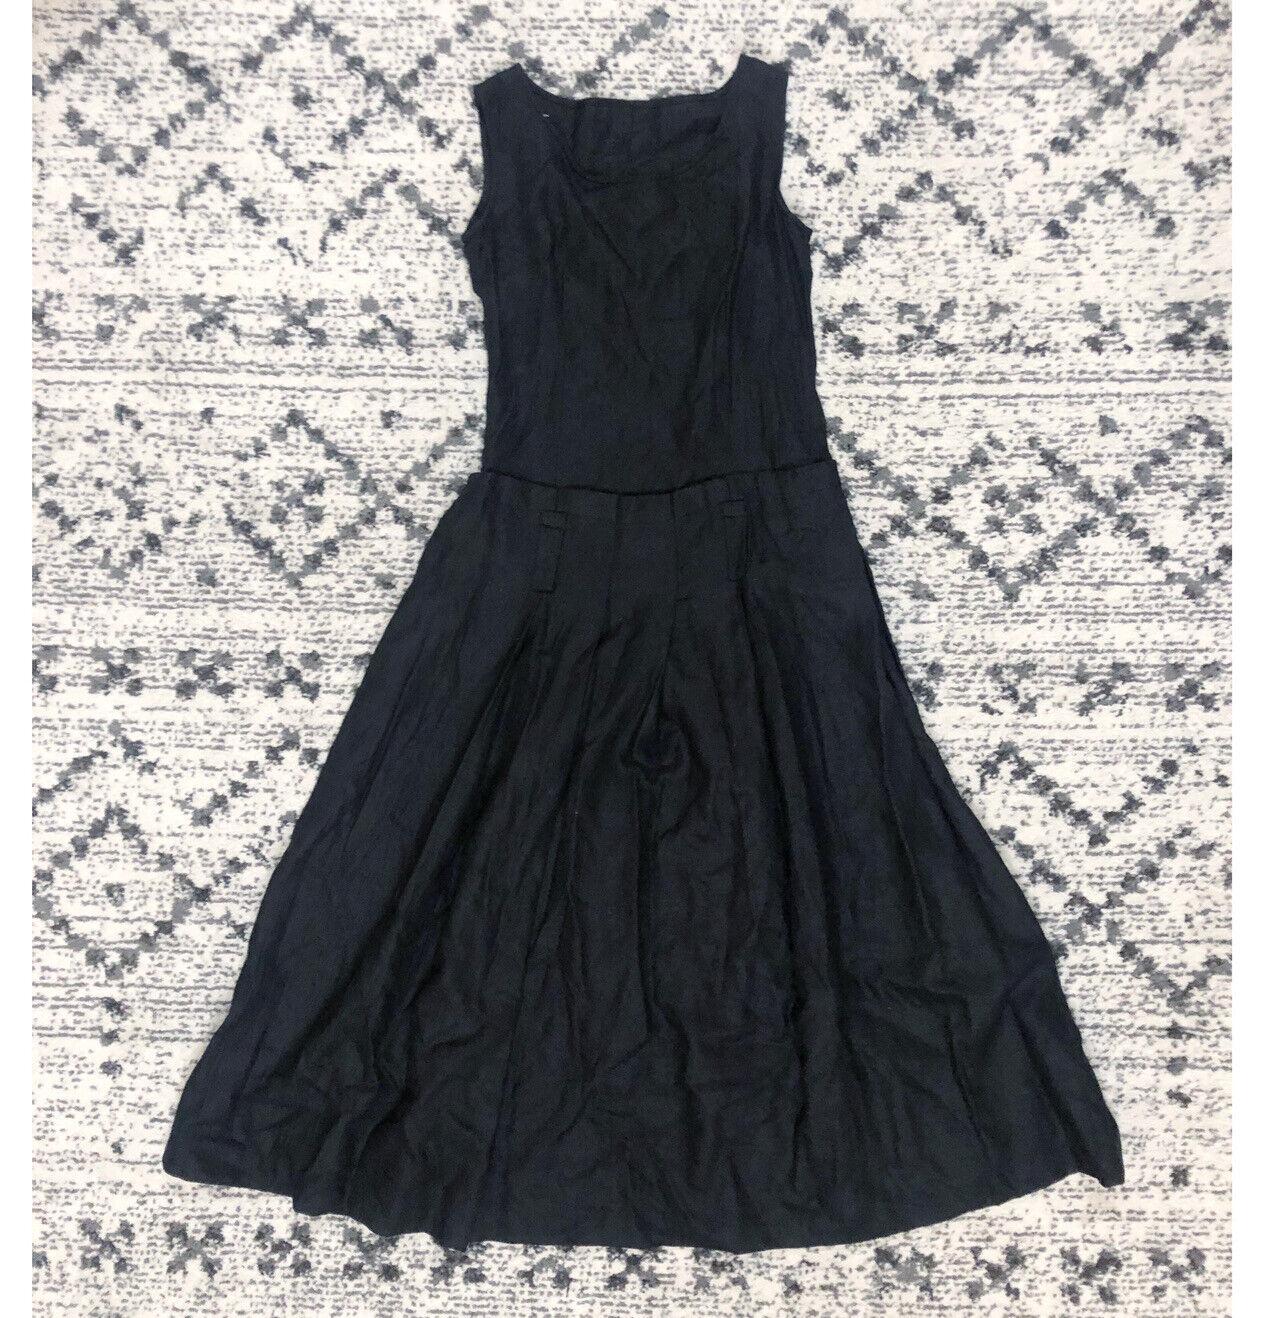 Vintage 90/'s Maxi-Dress in Black by Harold/'s